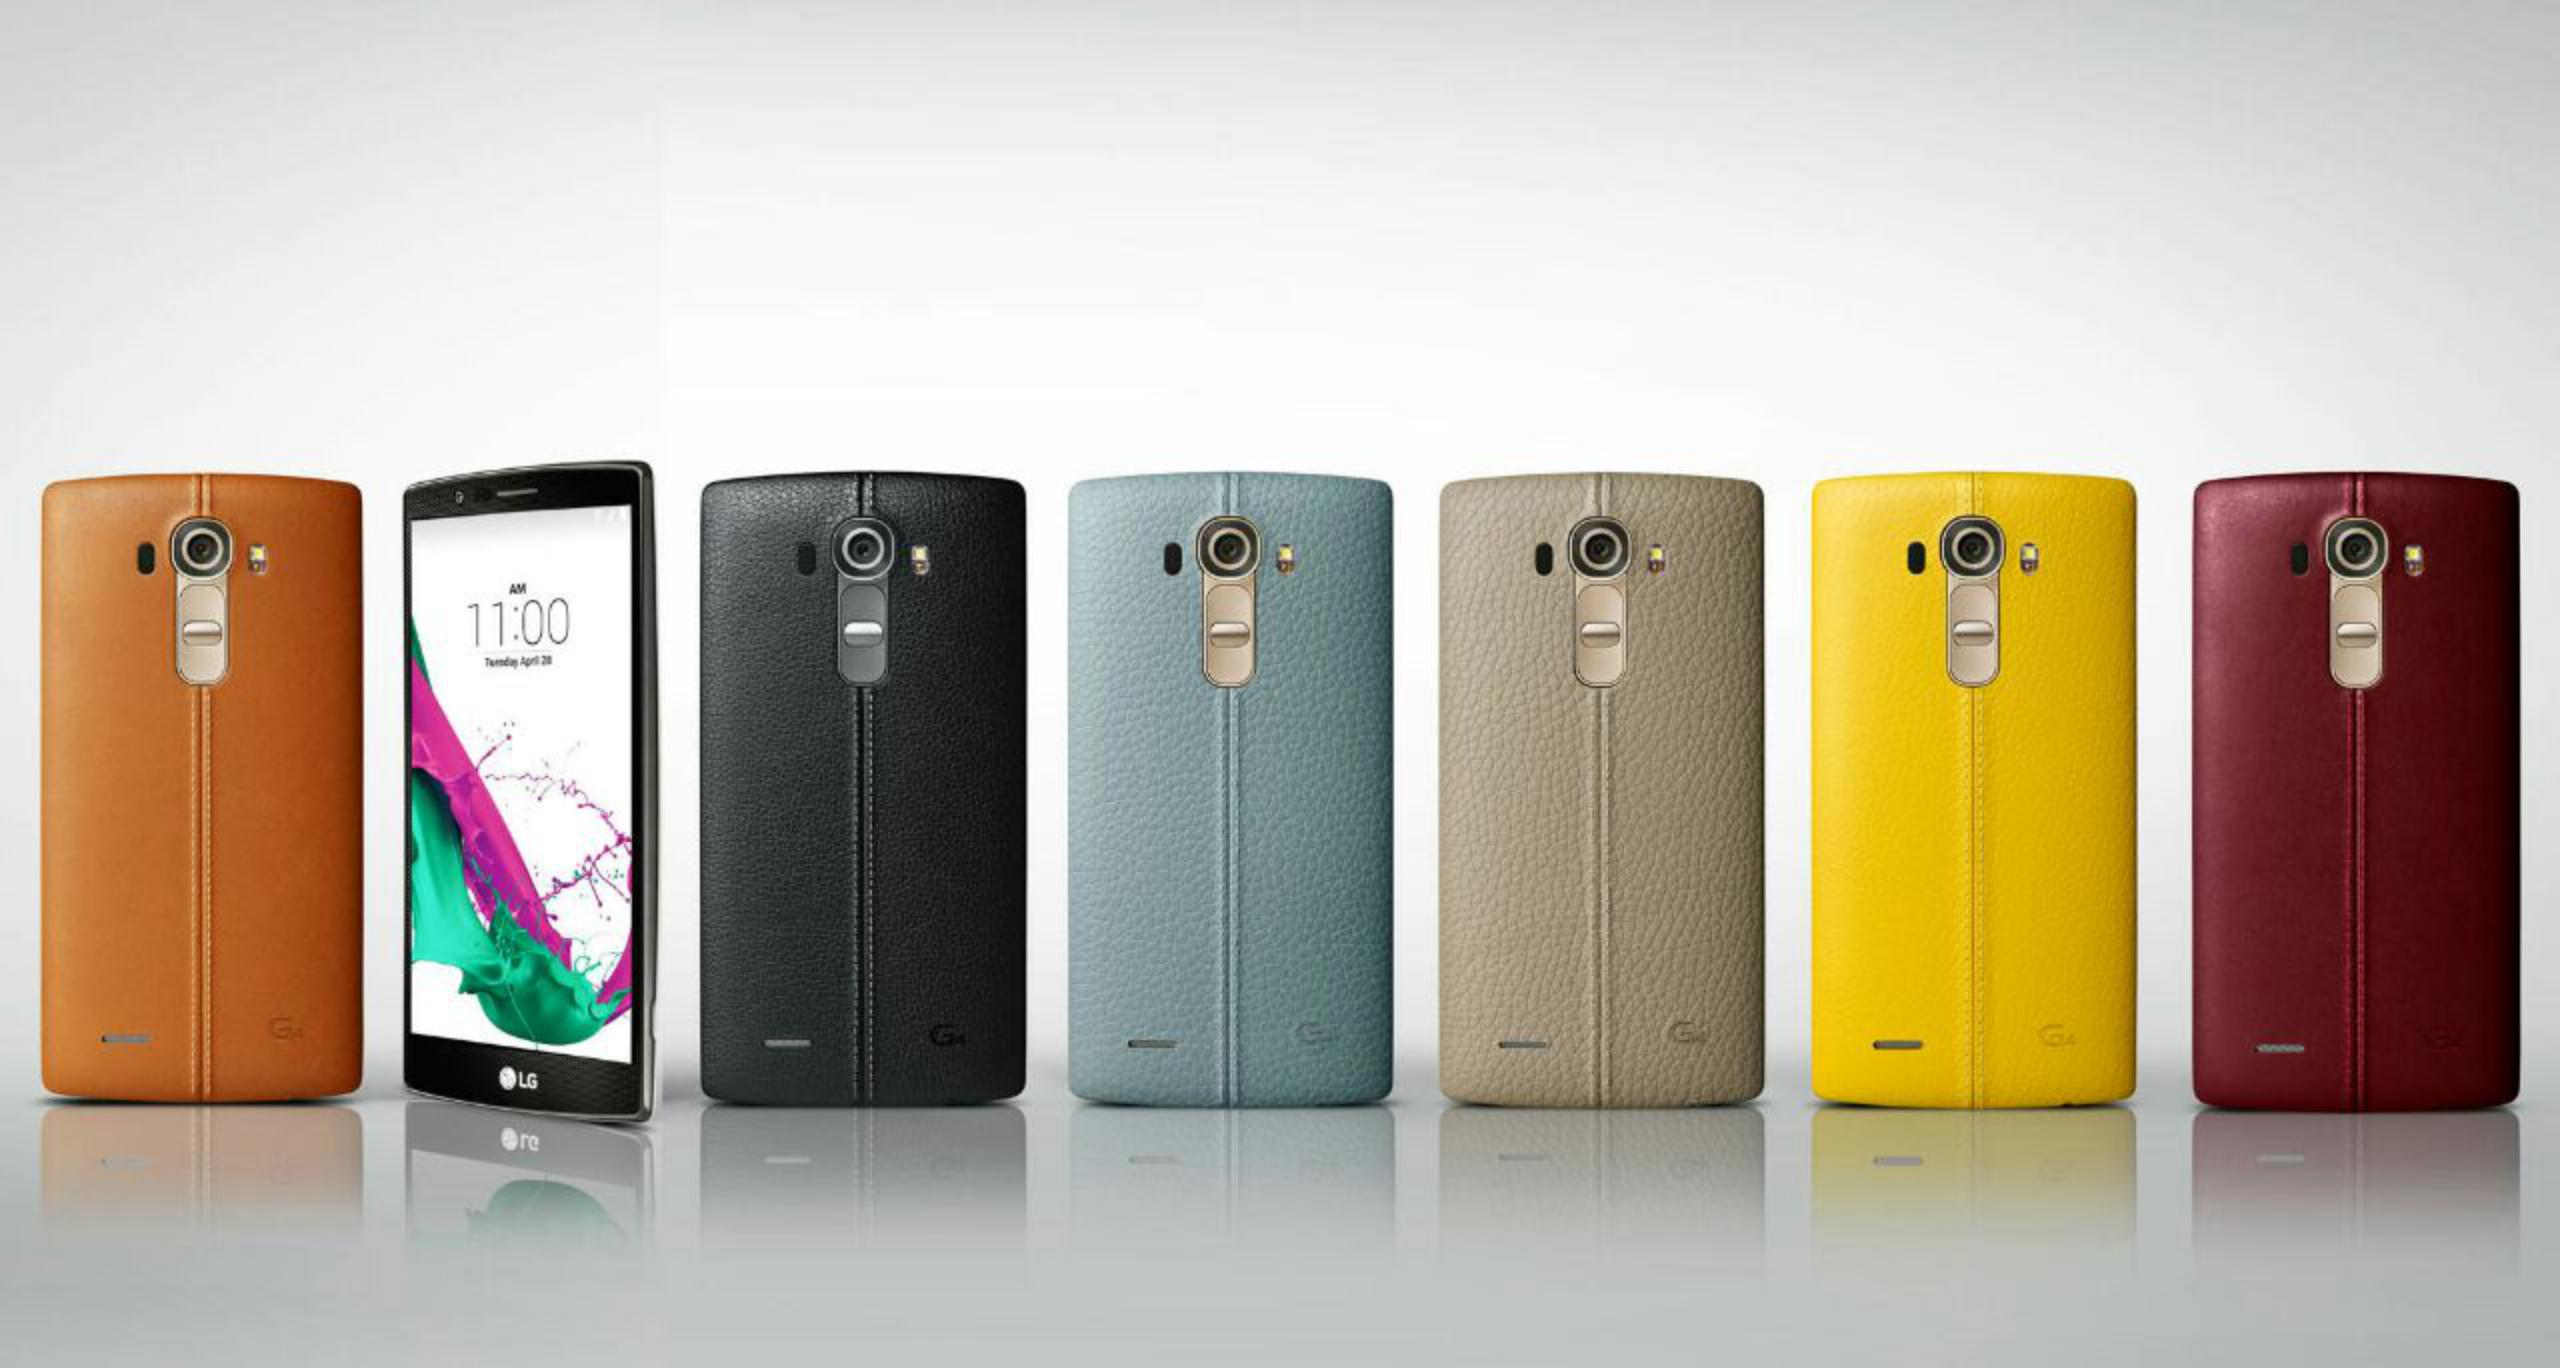 LG G4 Beat parece confirmar que el LG G4 será actualizado a Android 5.1.1 Lollipop 1